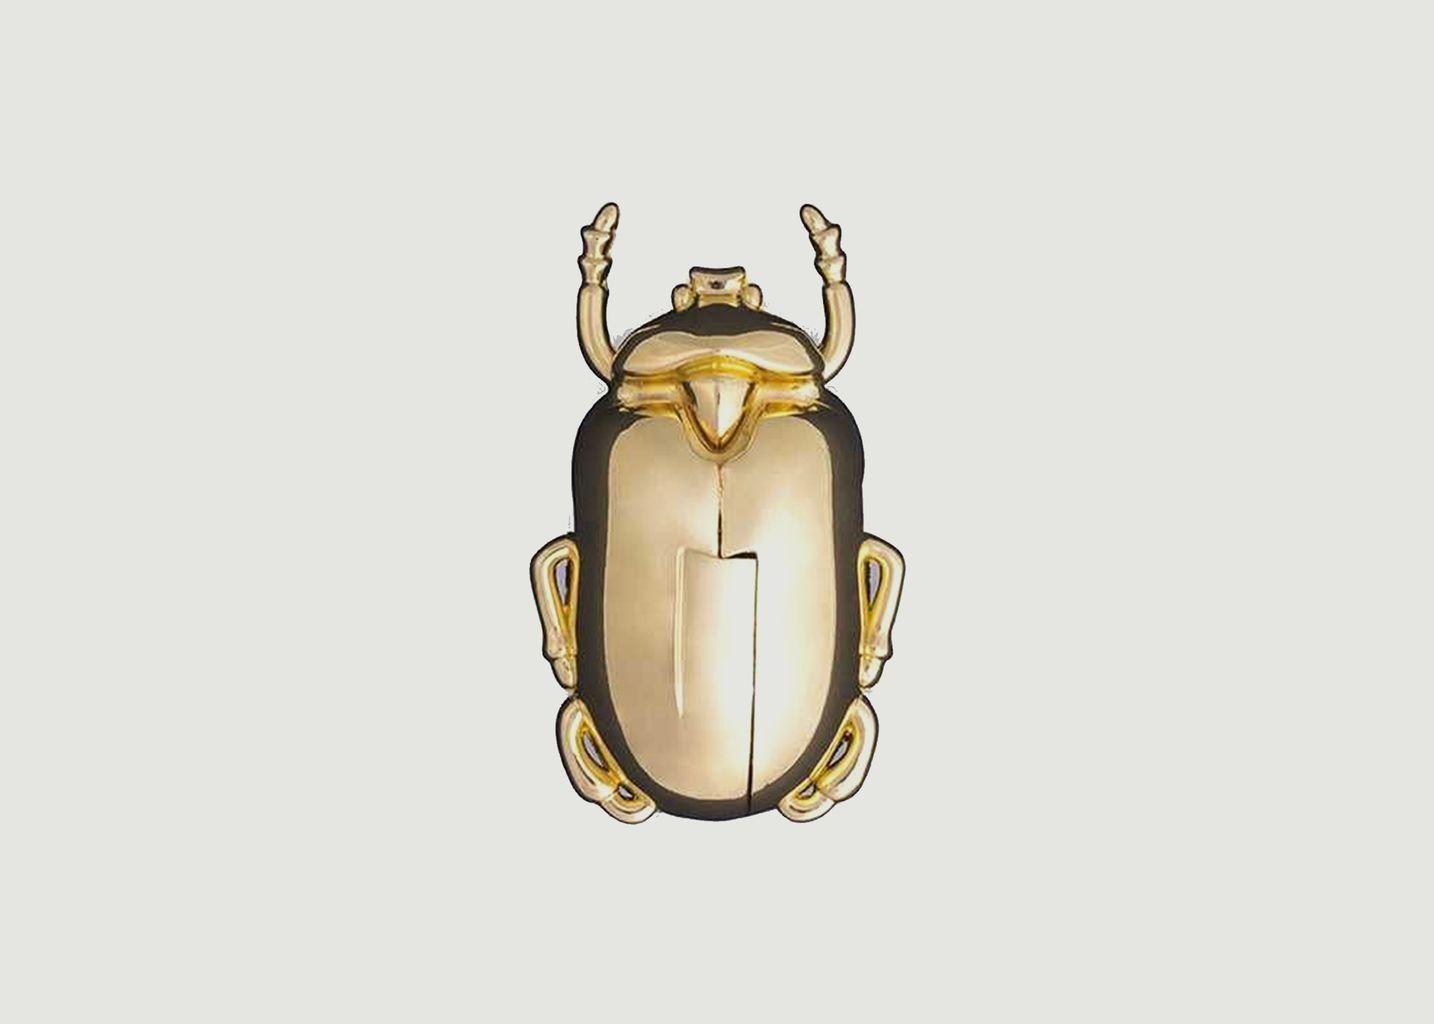 Tire-bouchon scarabée Insectum - Doiy